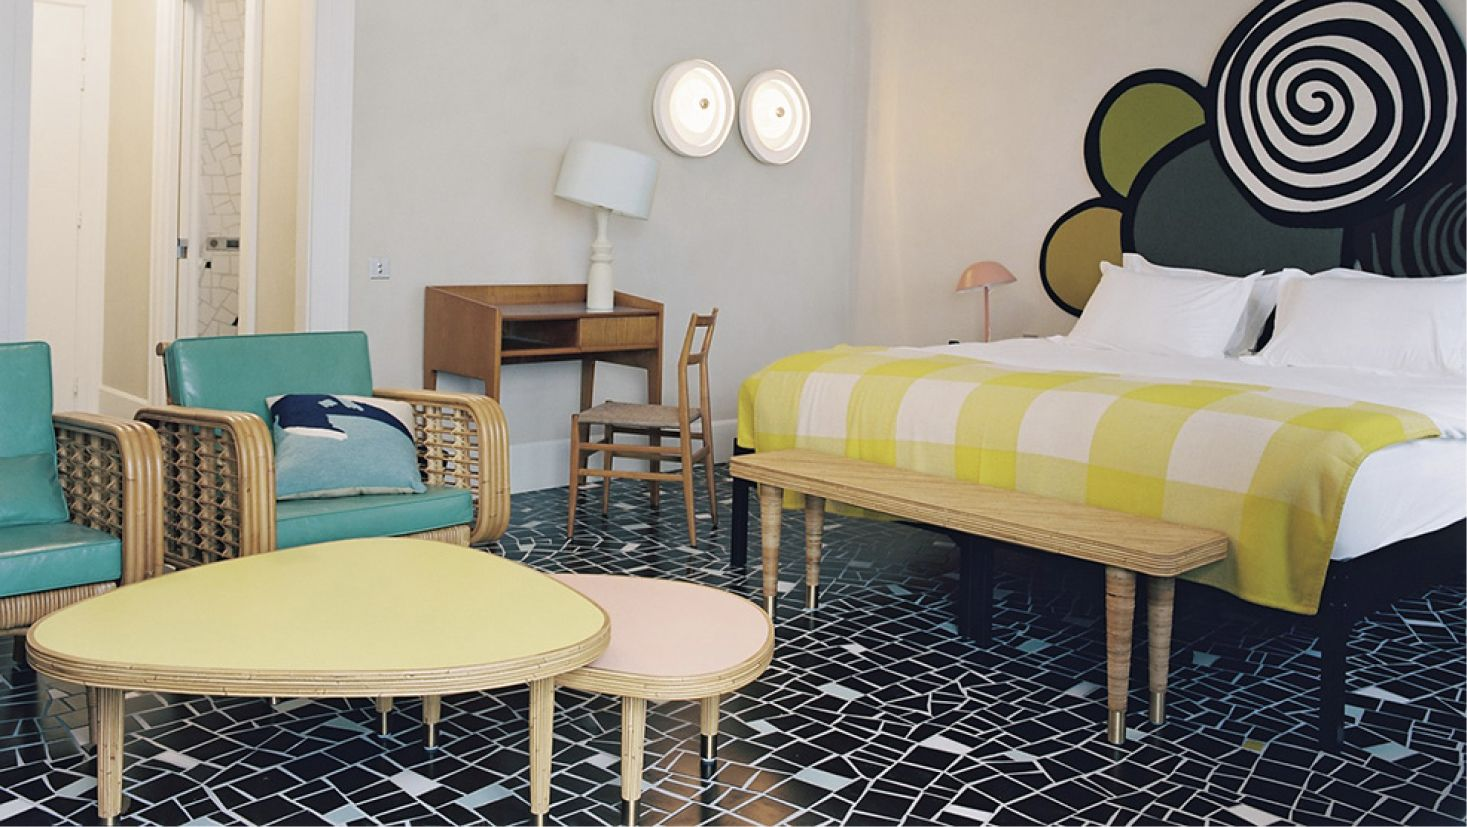 hotel du cloitre arles by india mahdavi via goodmoods. Black Bedroom Furniture Sets. Home Design Ideas